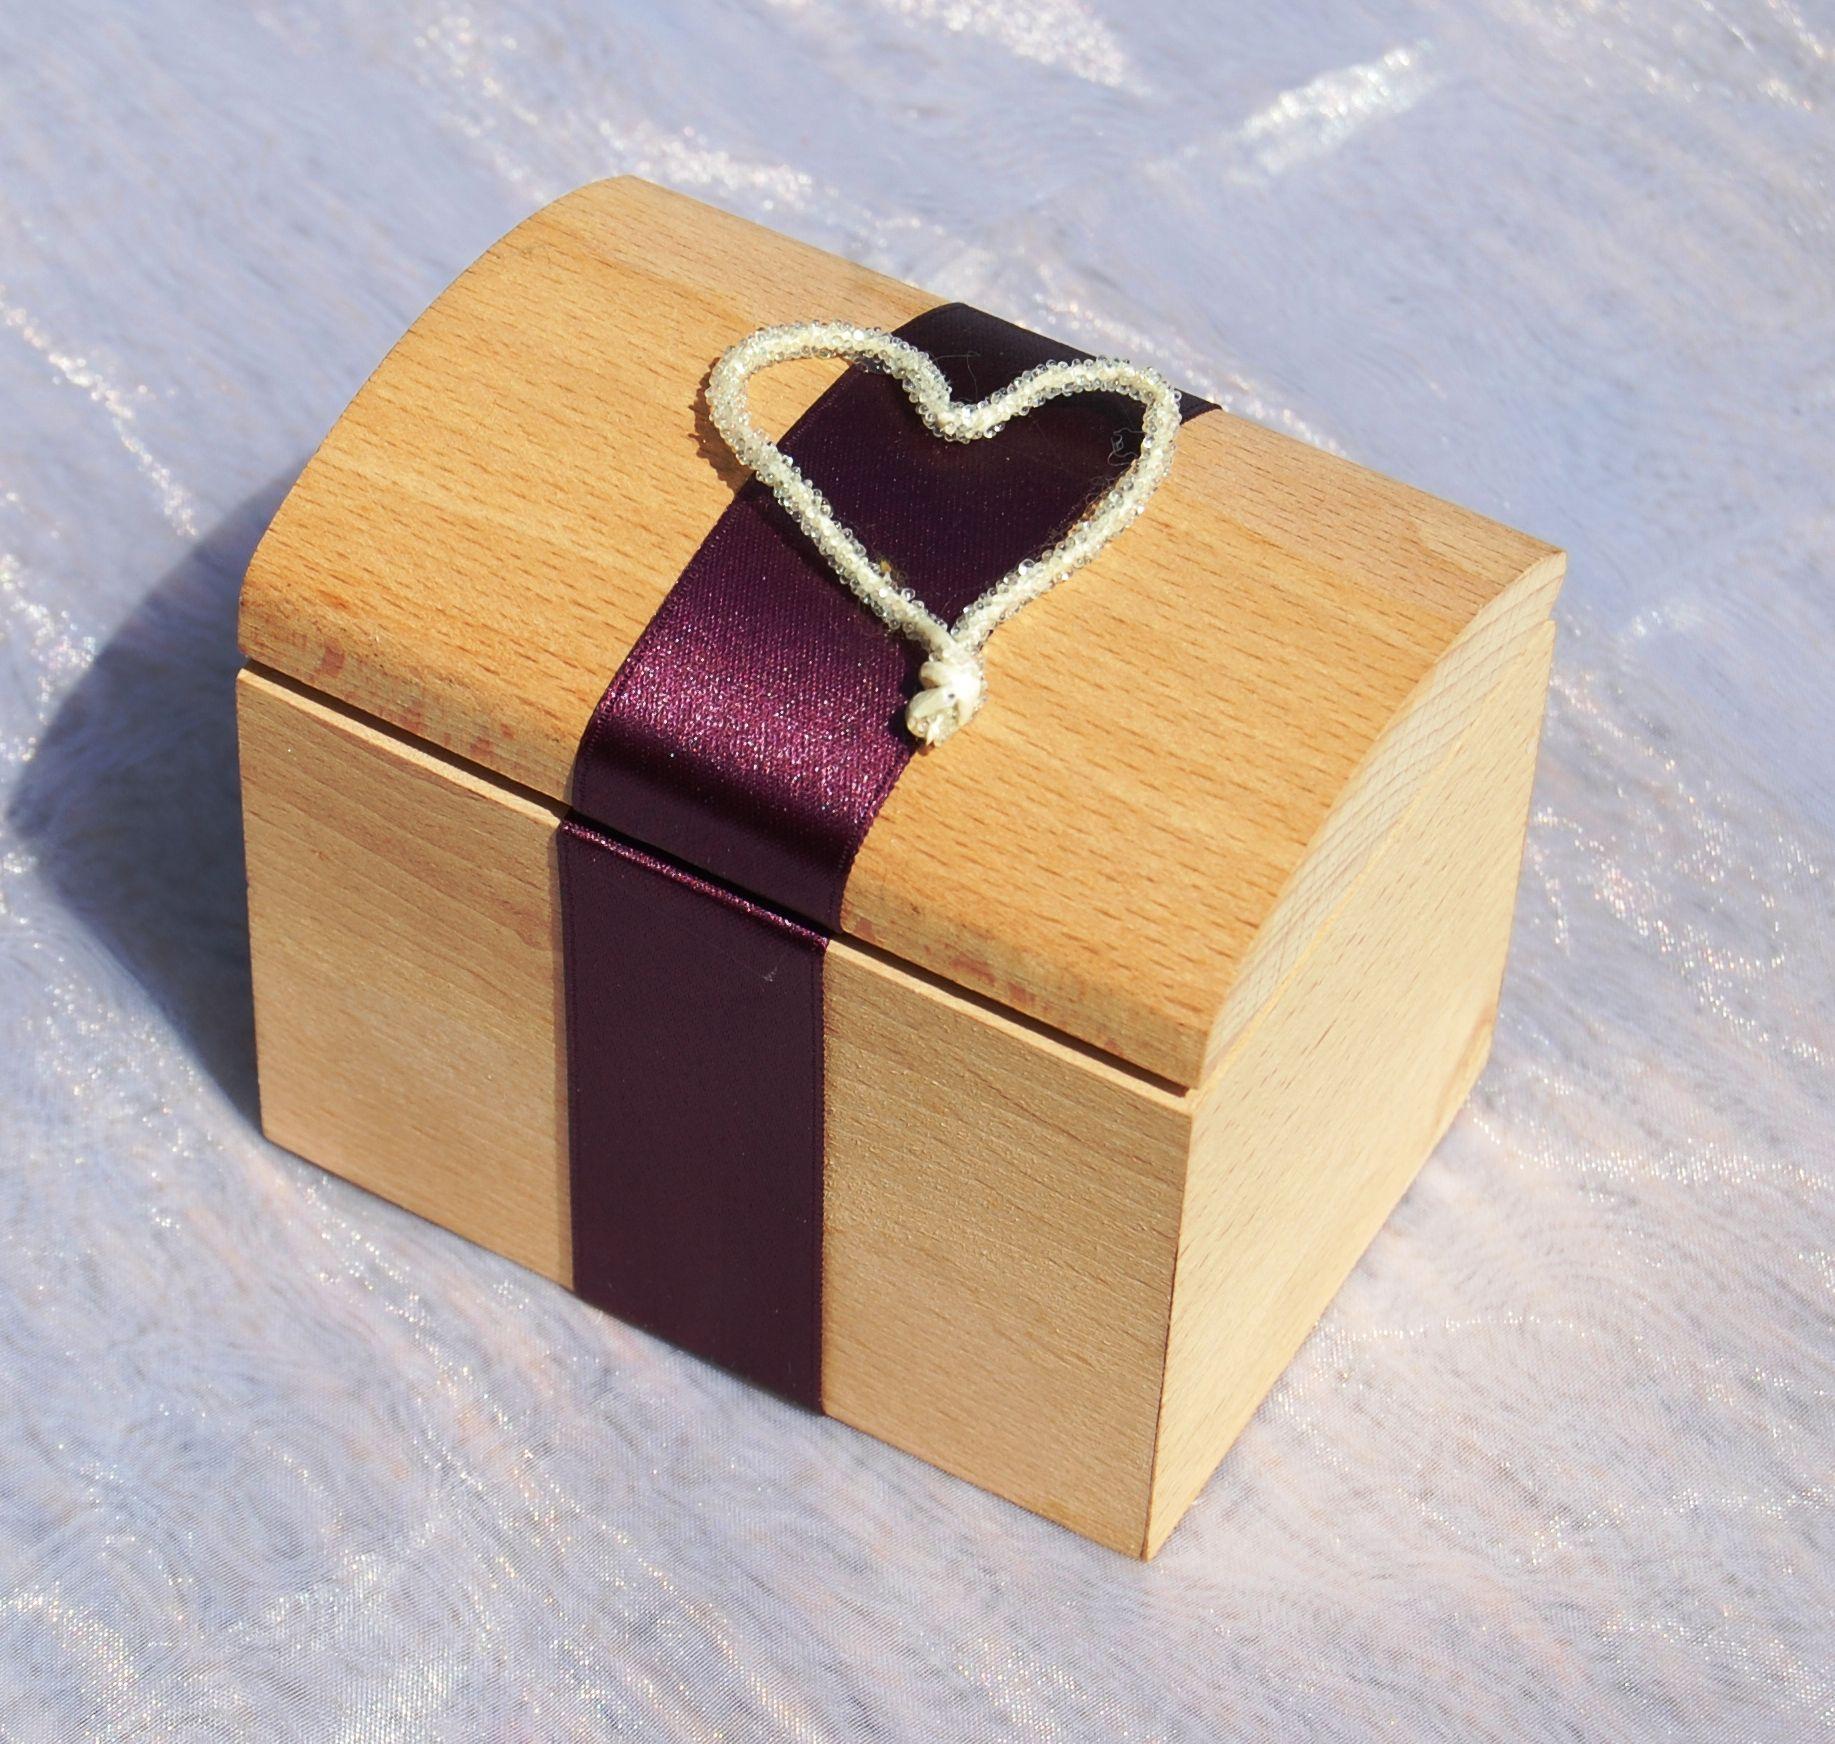 Matrimonio Tema Hobbit : Portafedi scatola legno impronte sulle nuvole